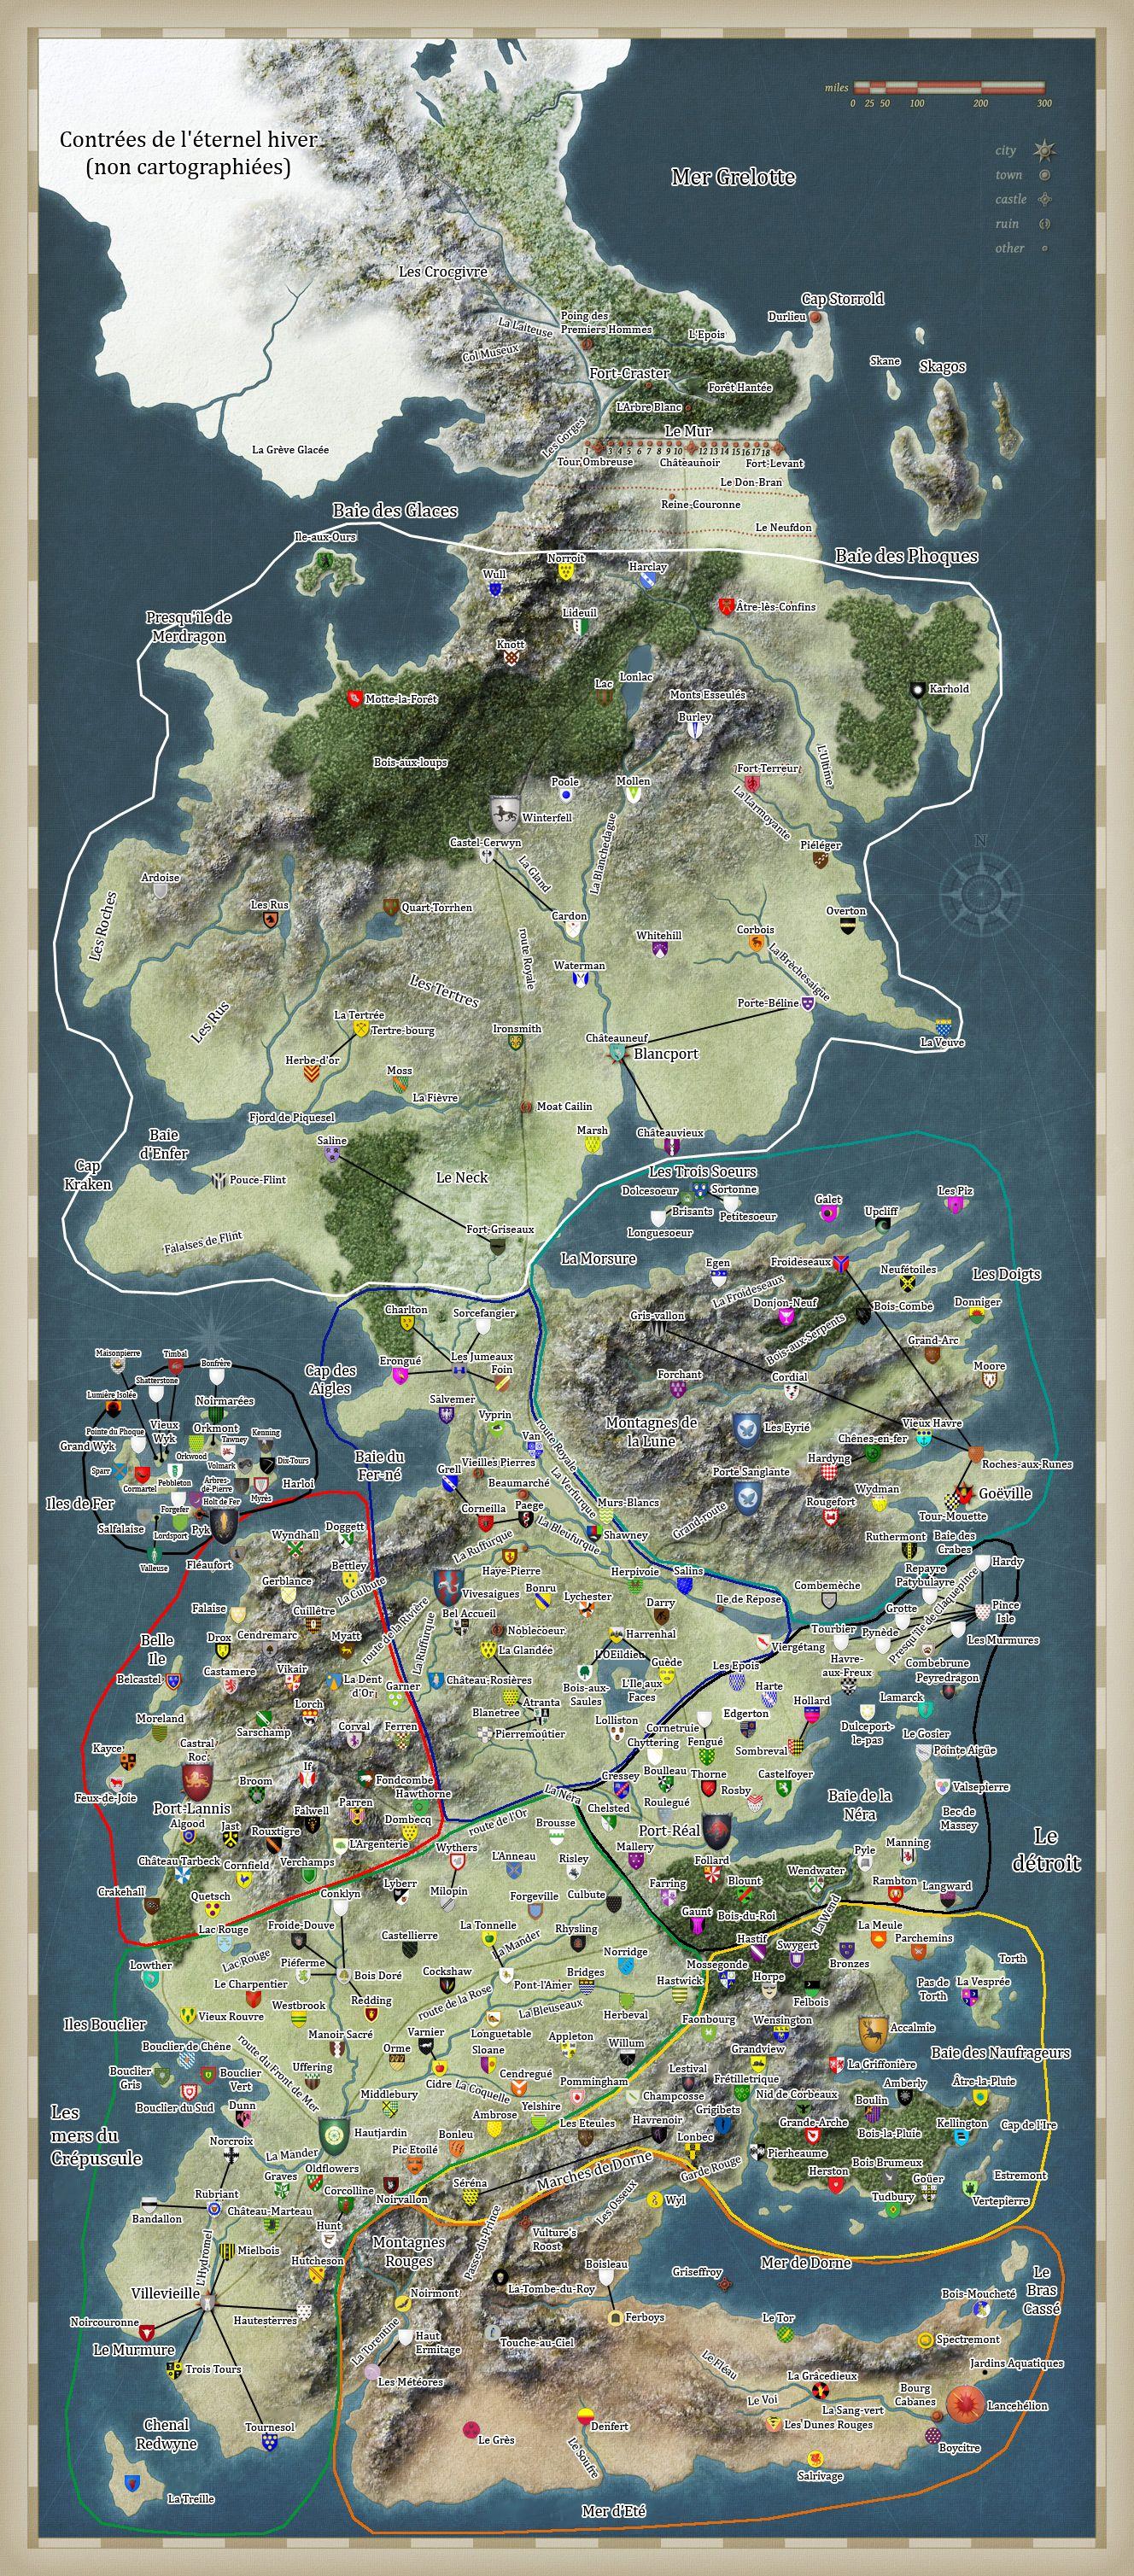 Carte Game Of Thrones 7 Royaumes : carte, thrones, royaumes, Carte, Couronnes, (games, Thrones)., Carte,, Géographie